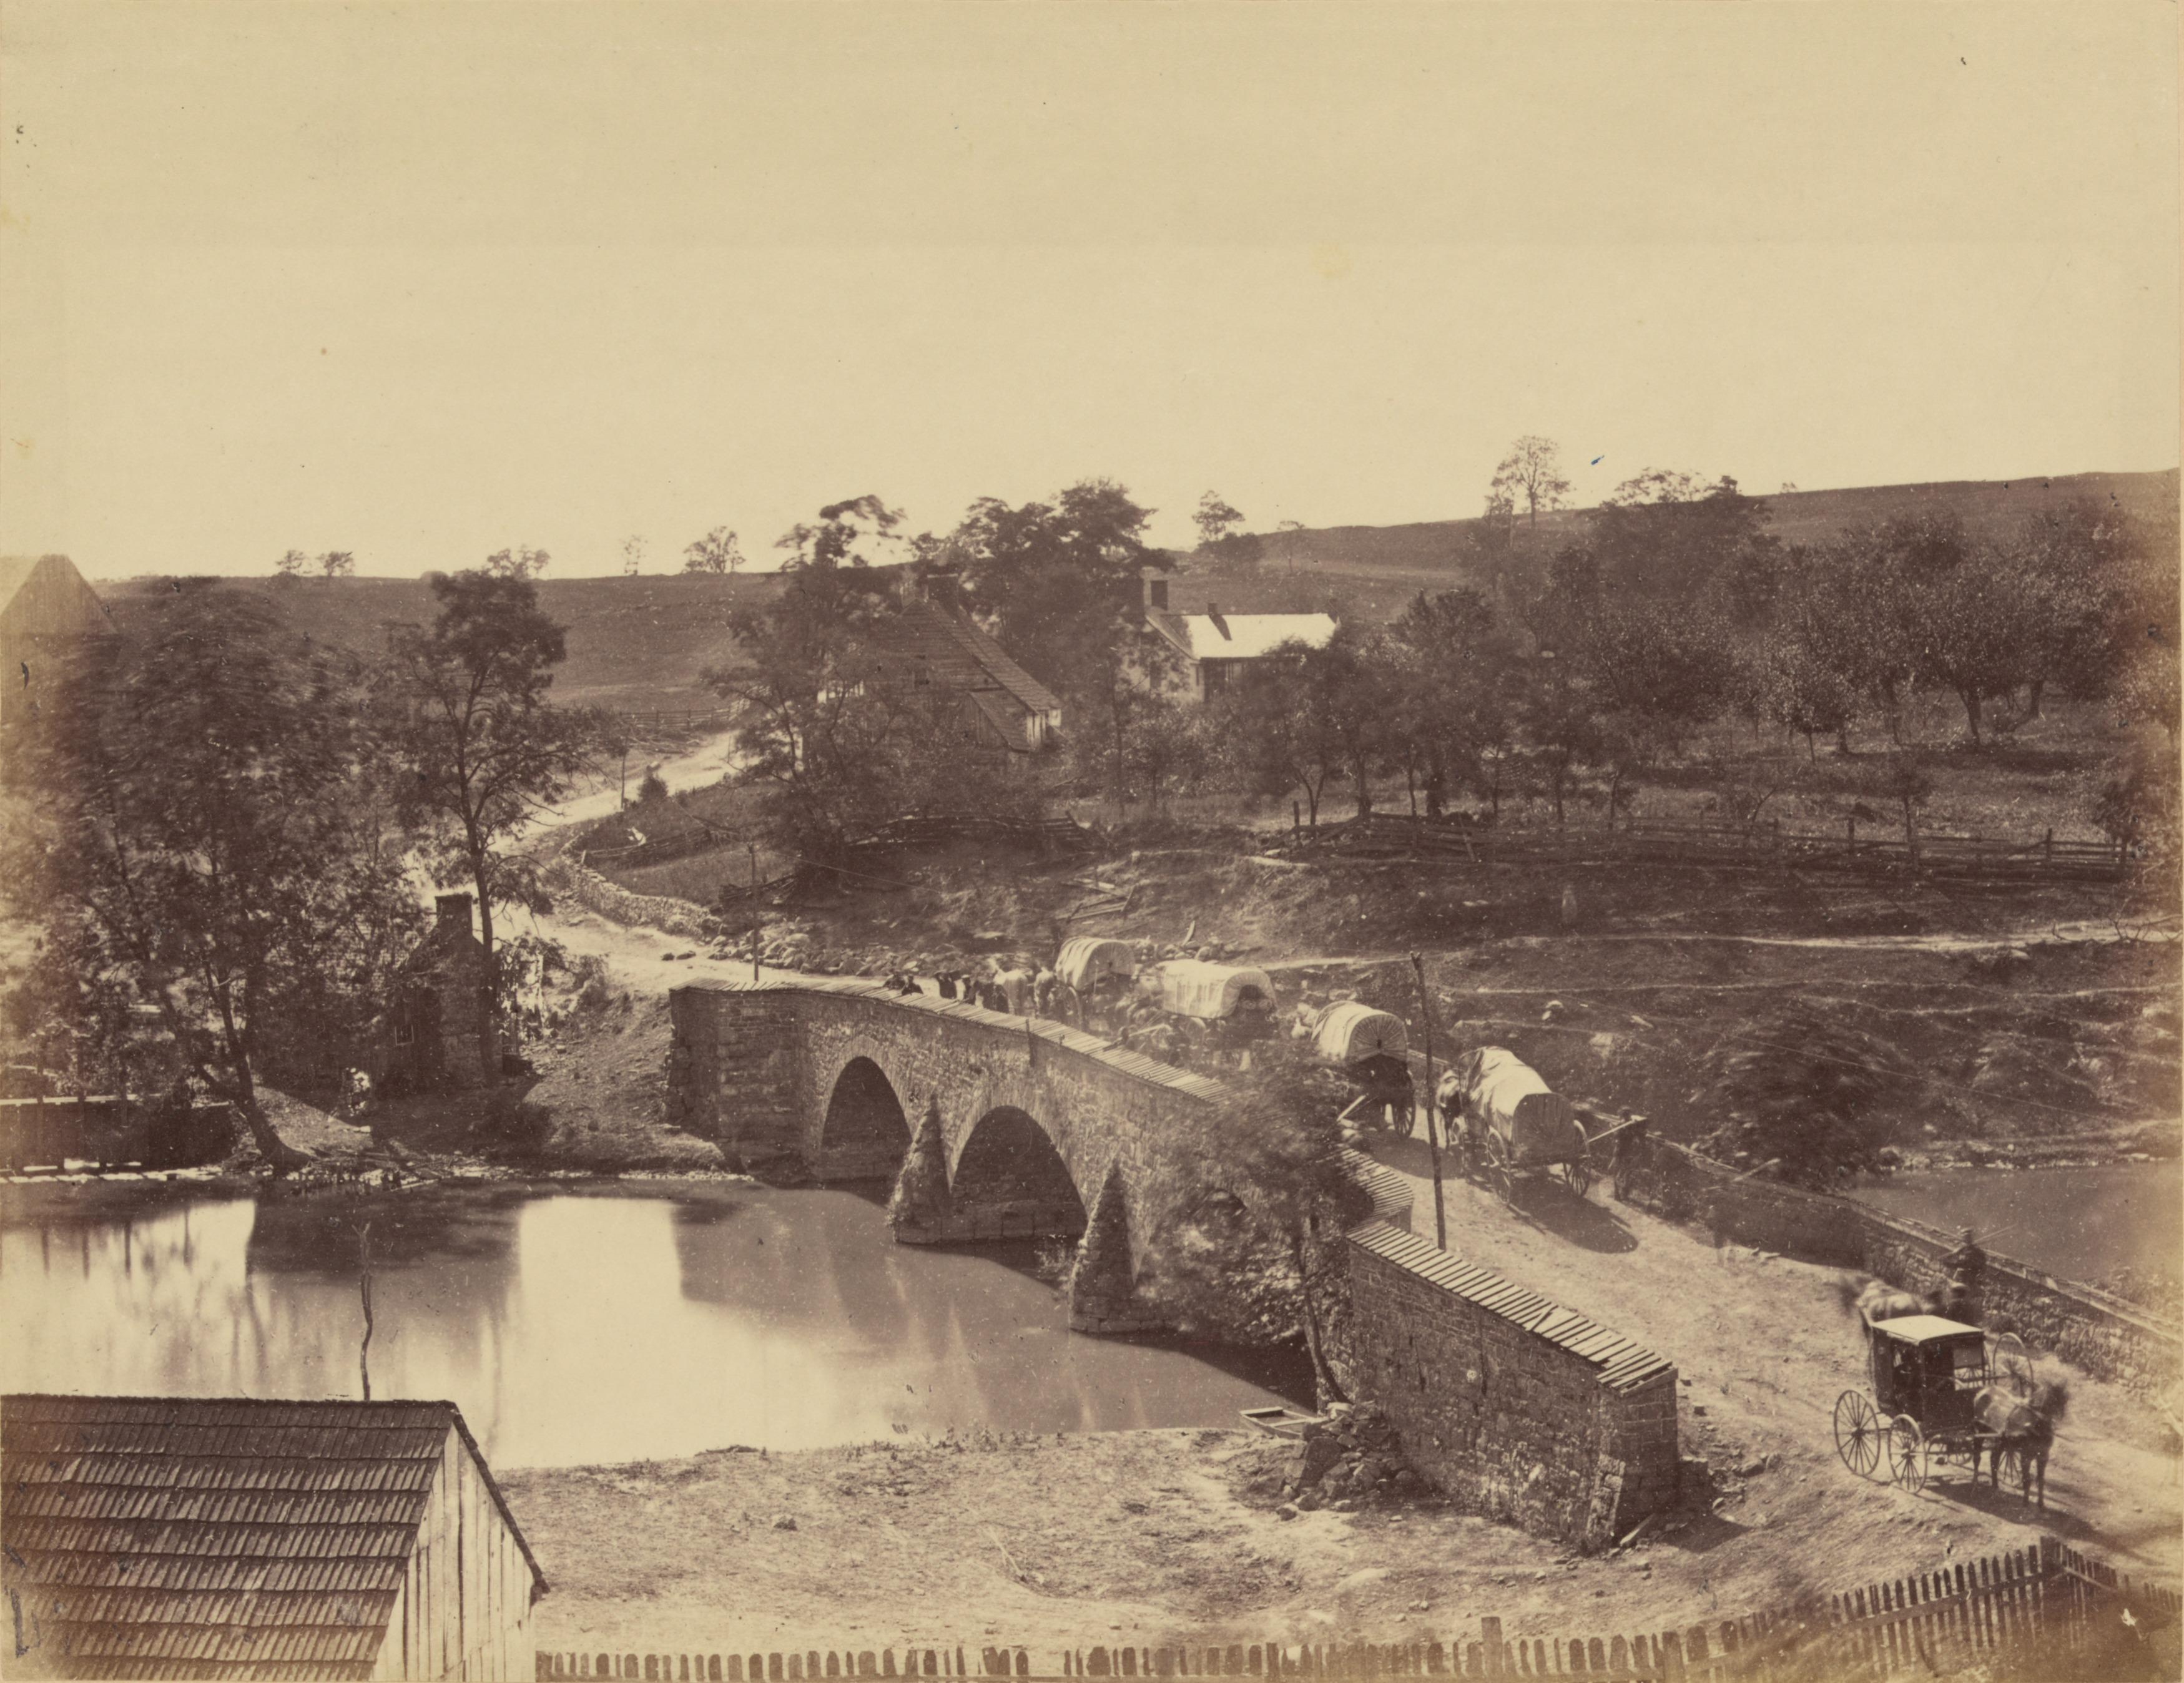 Antietam Bridge Alexander Gardner 1862